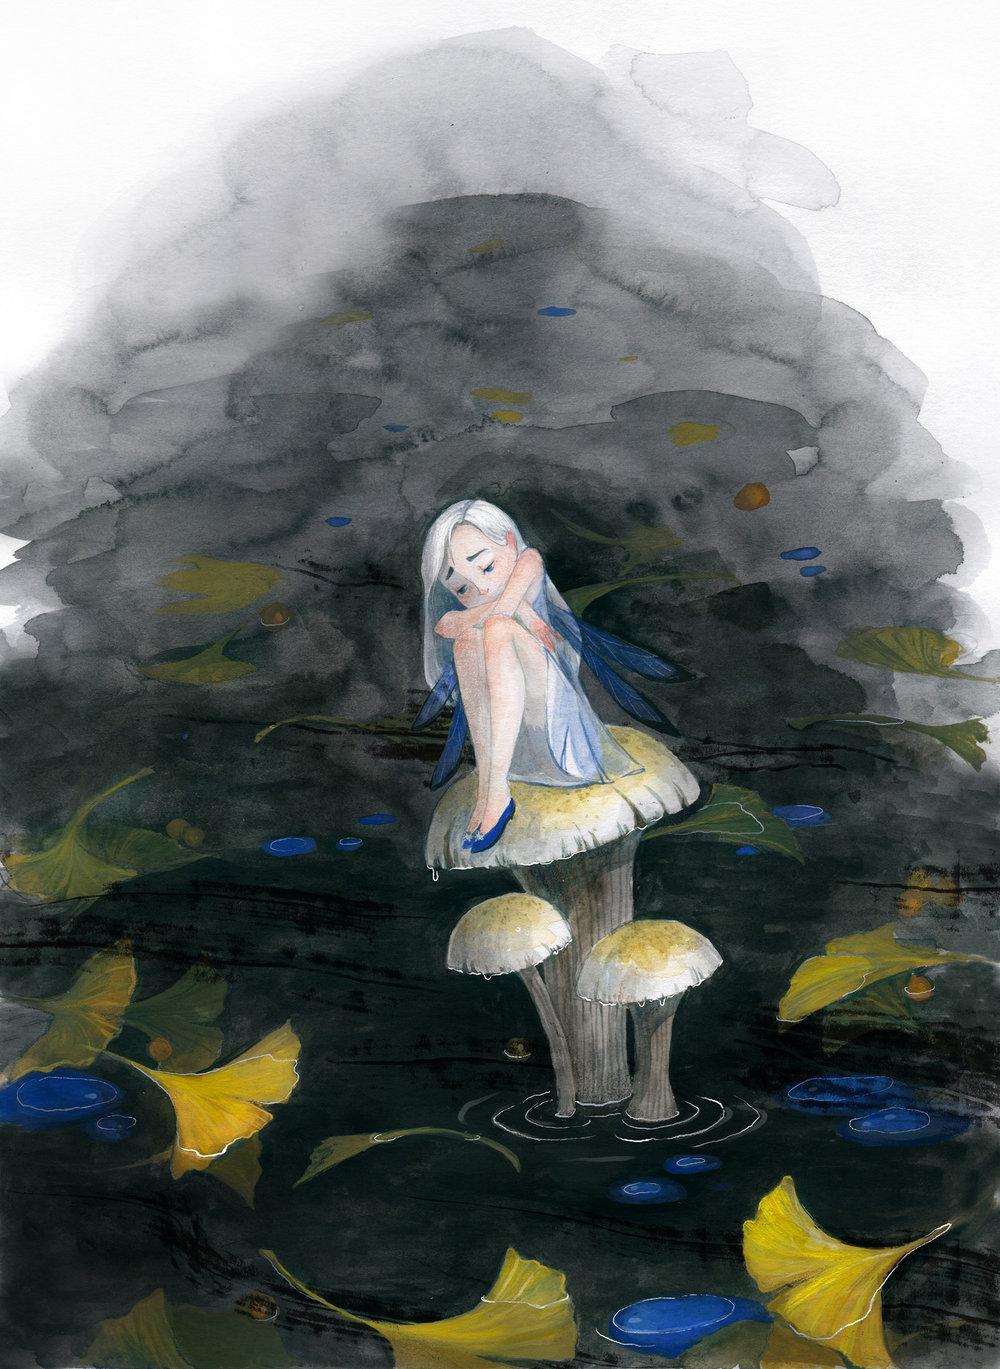 Fairy3422150dpi.jpg